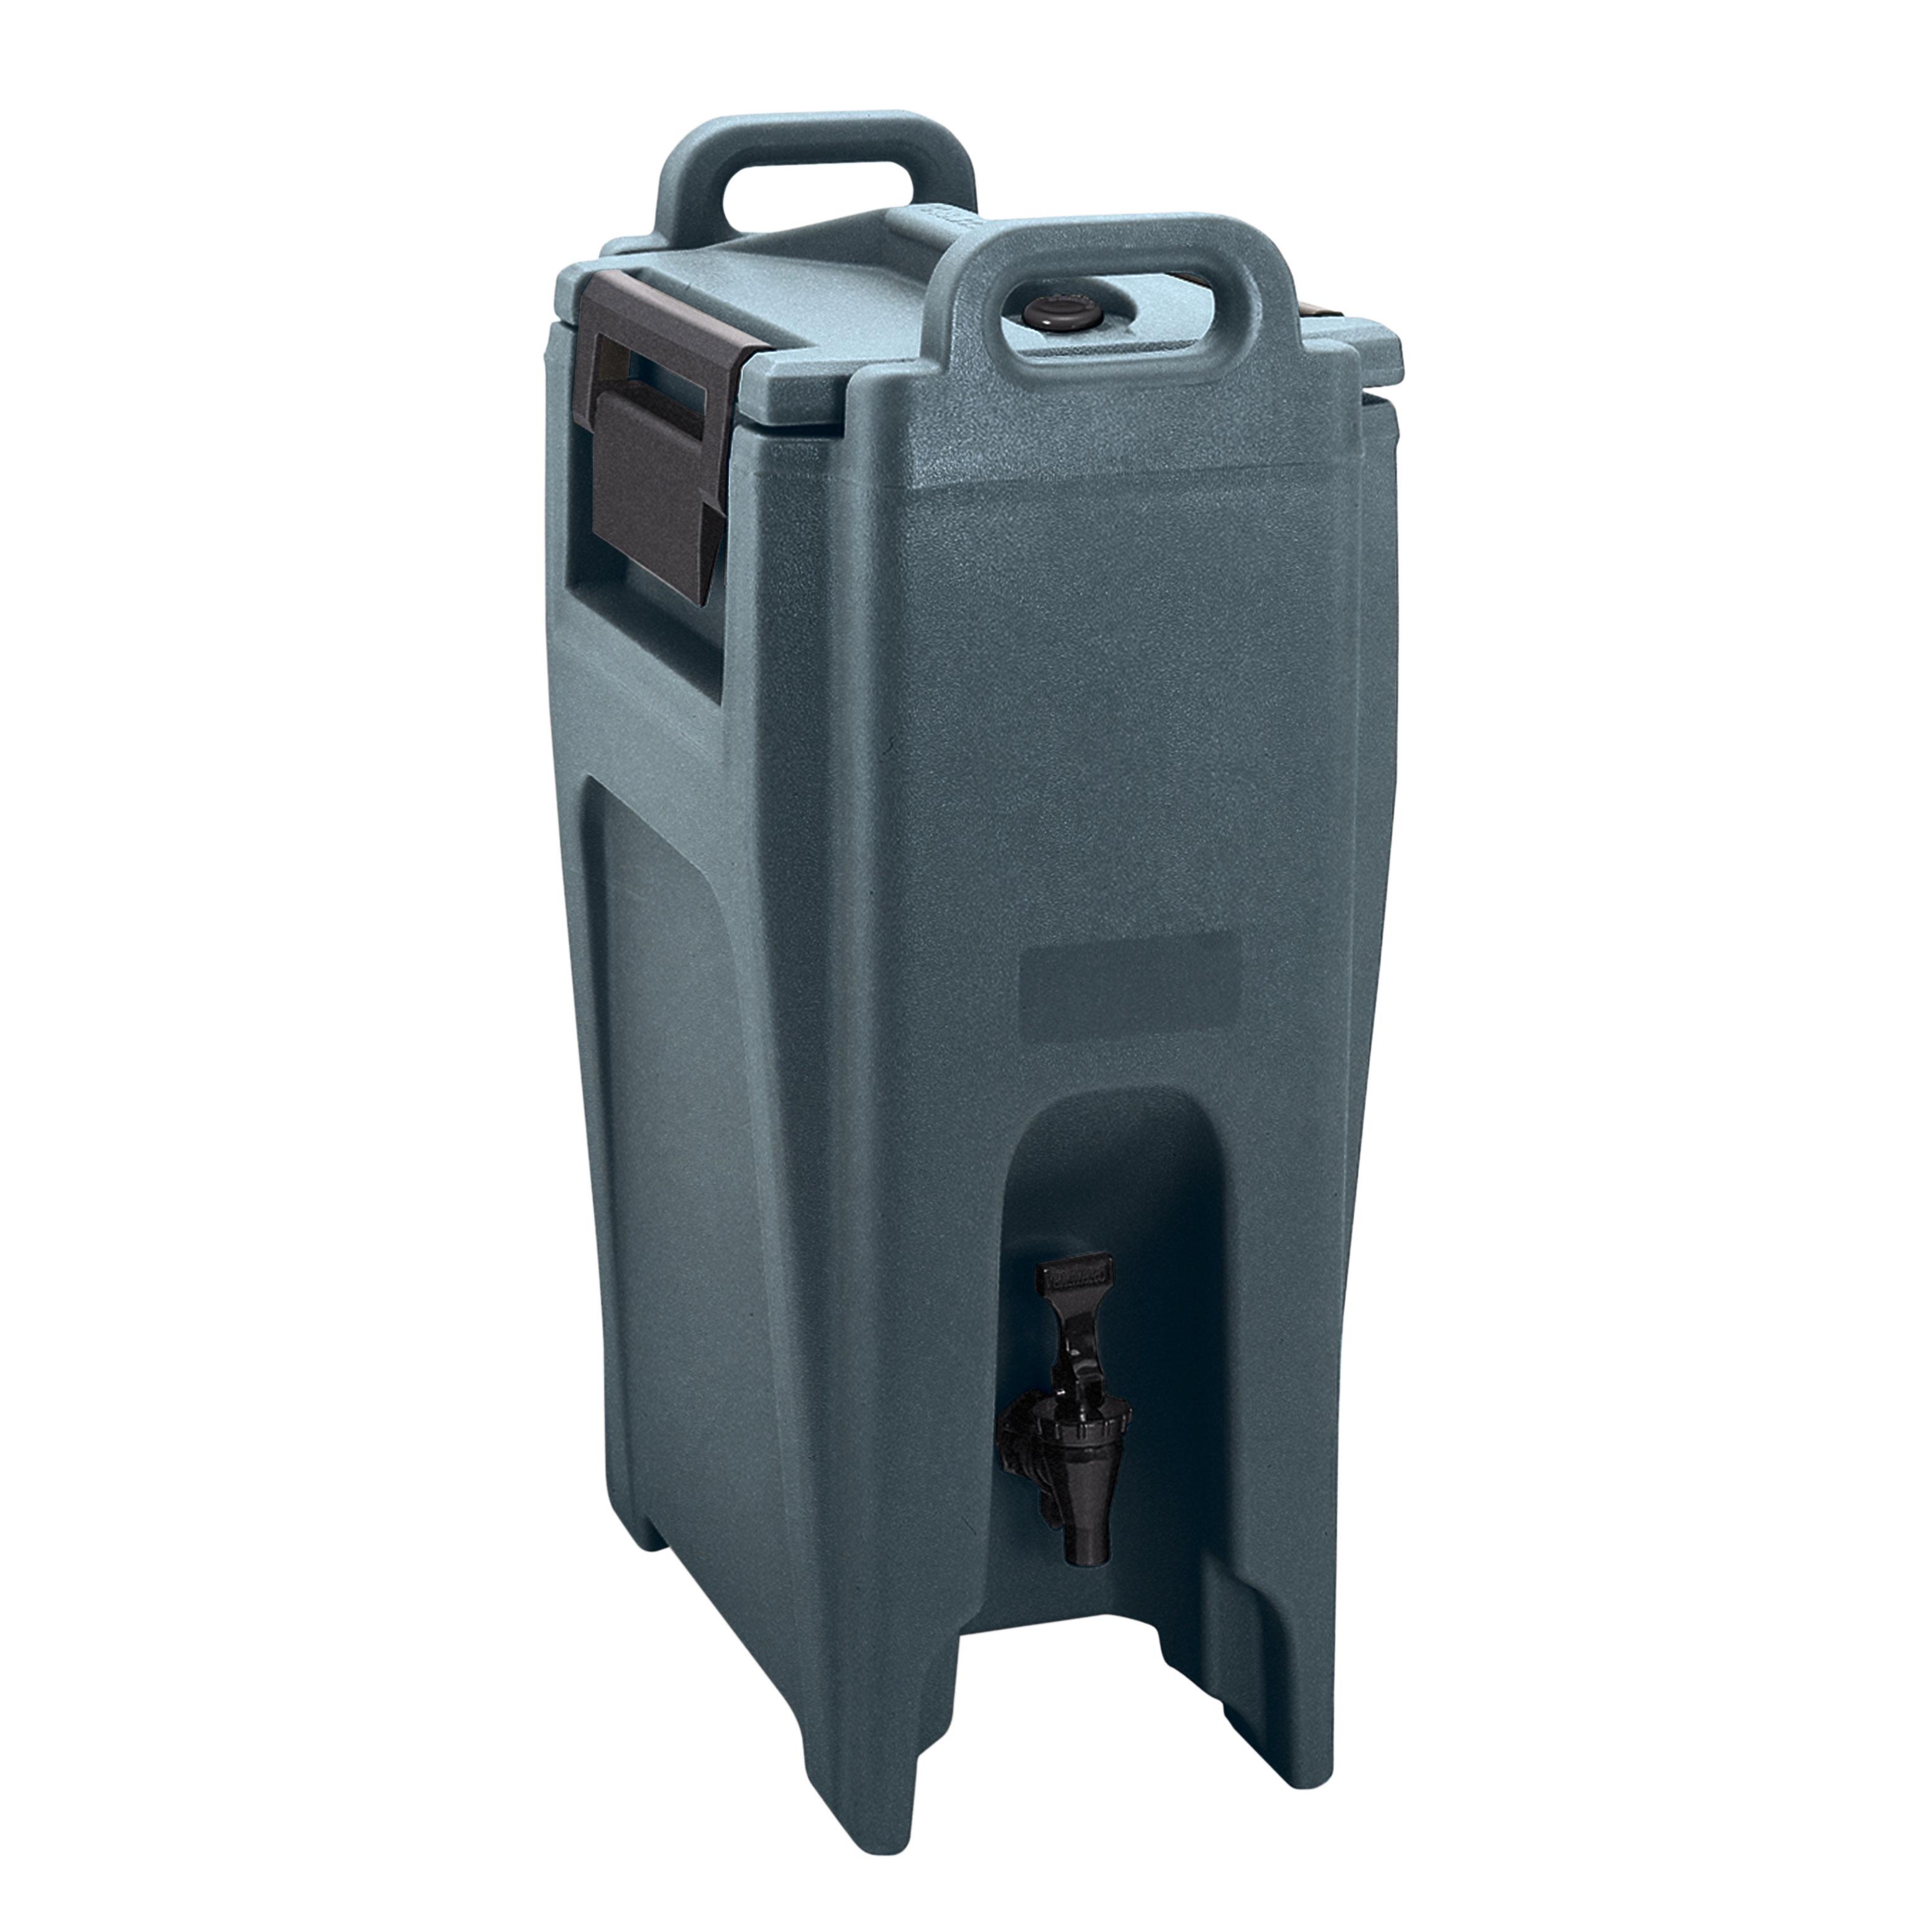 Cambro UC500191 beverage dispensers